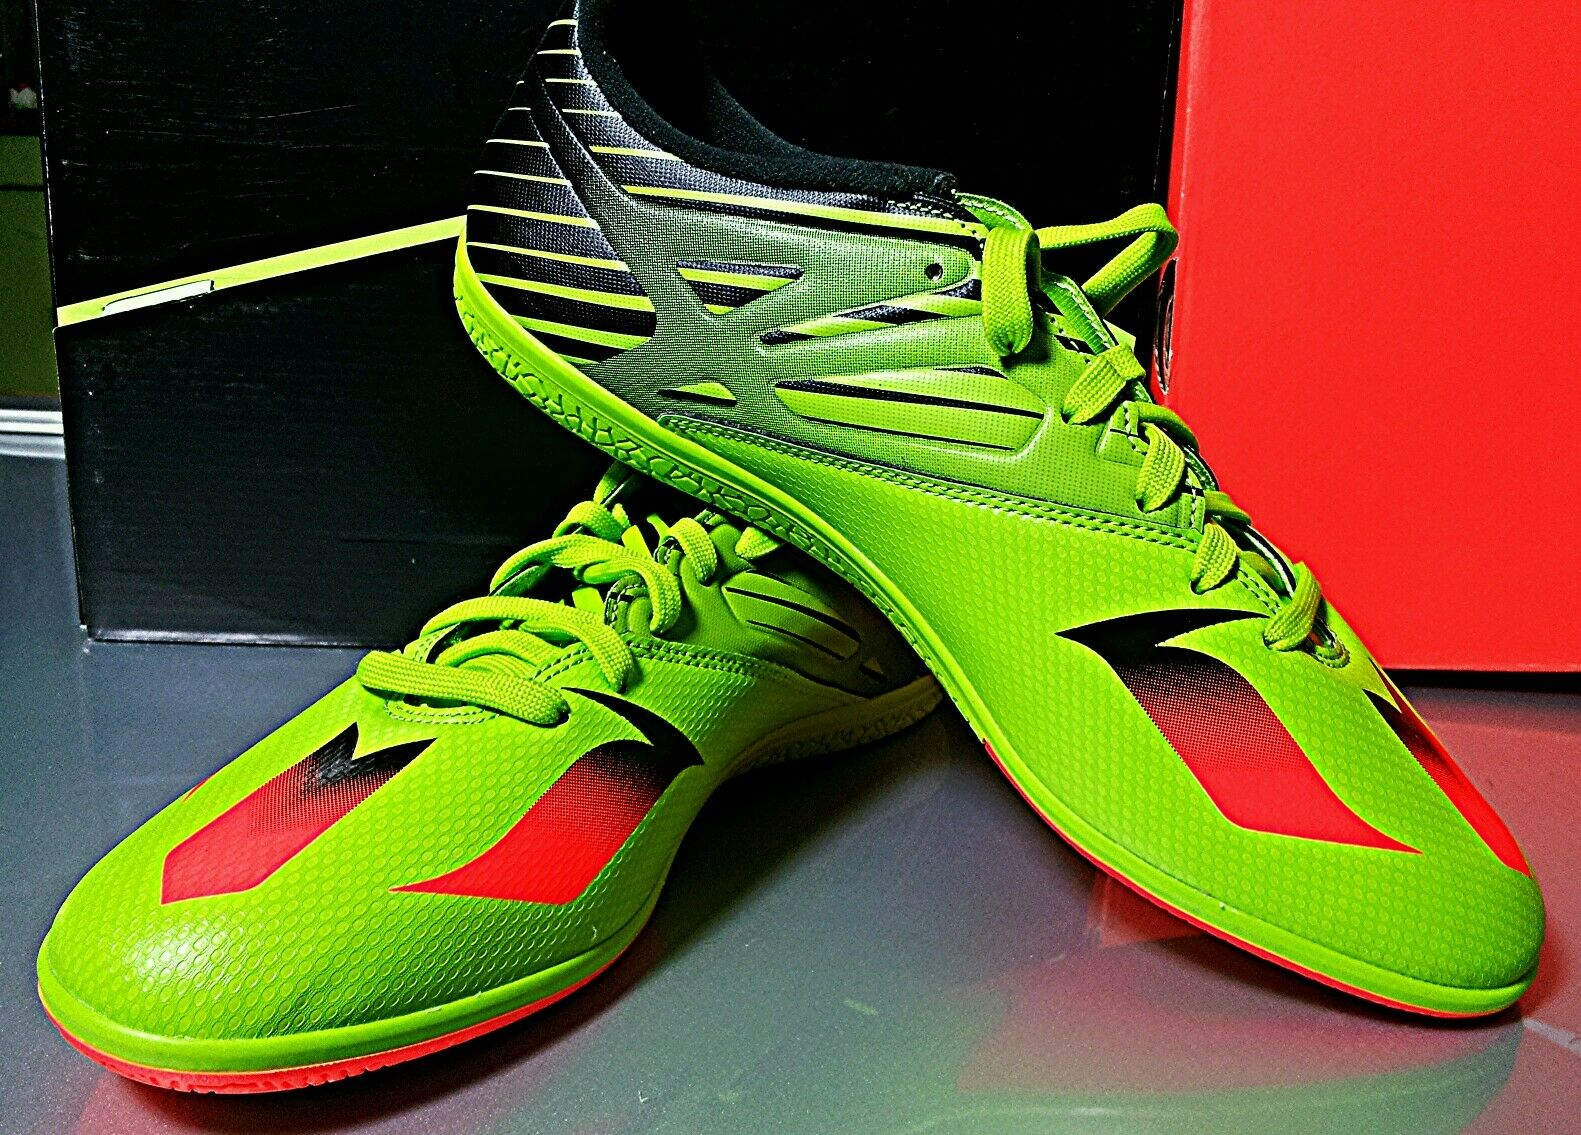 Adidas Men's Messi 15.3 Built to Win Indoor Soccer shoes ART S74691 Size 11